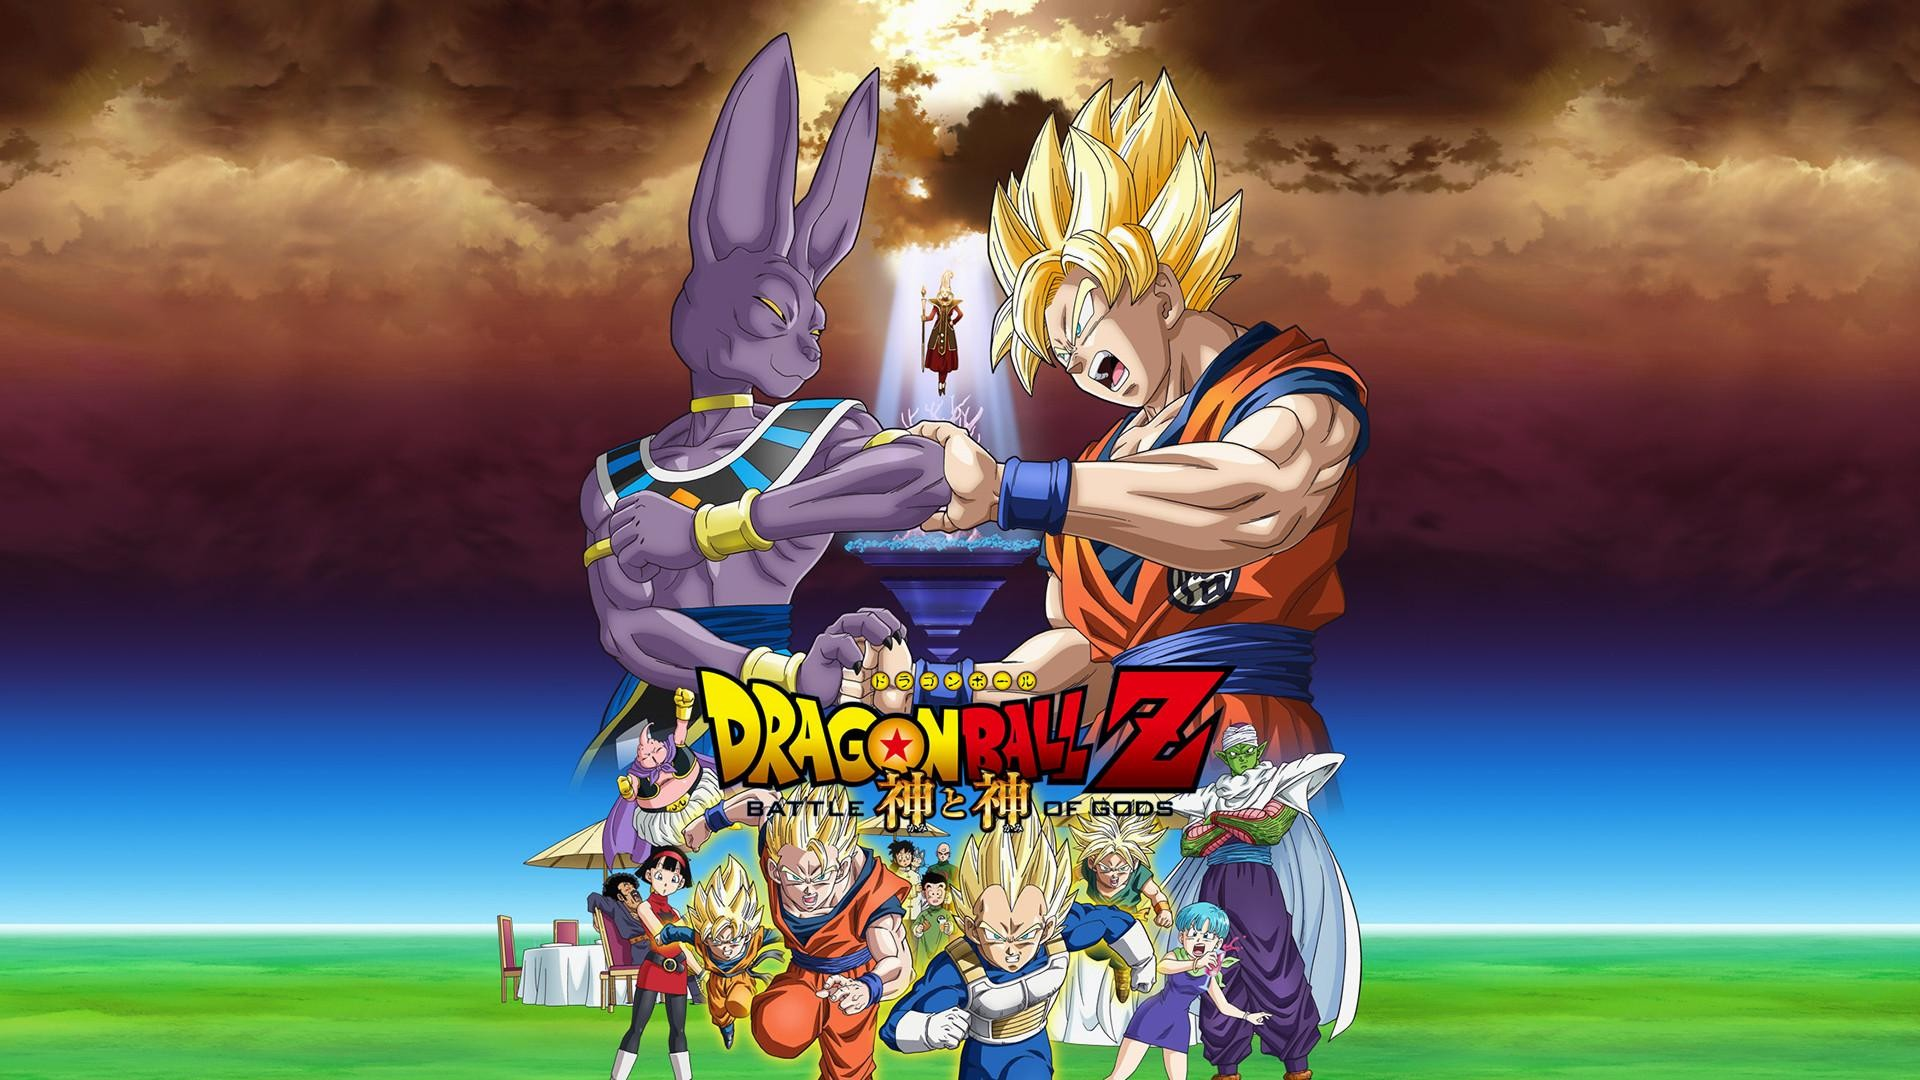 Dragon-Ball-Z-Wallpapers-1